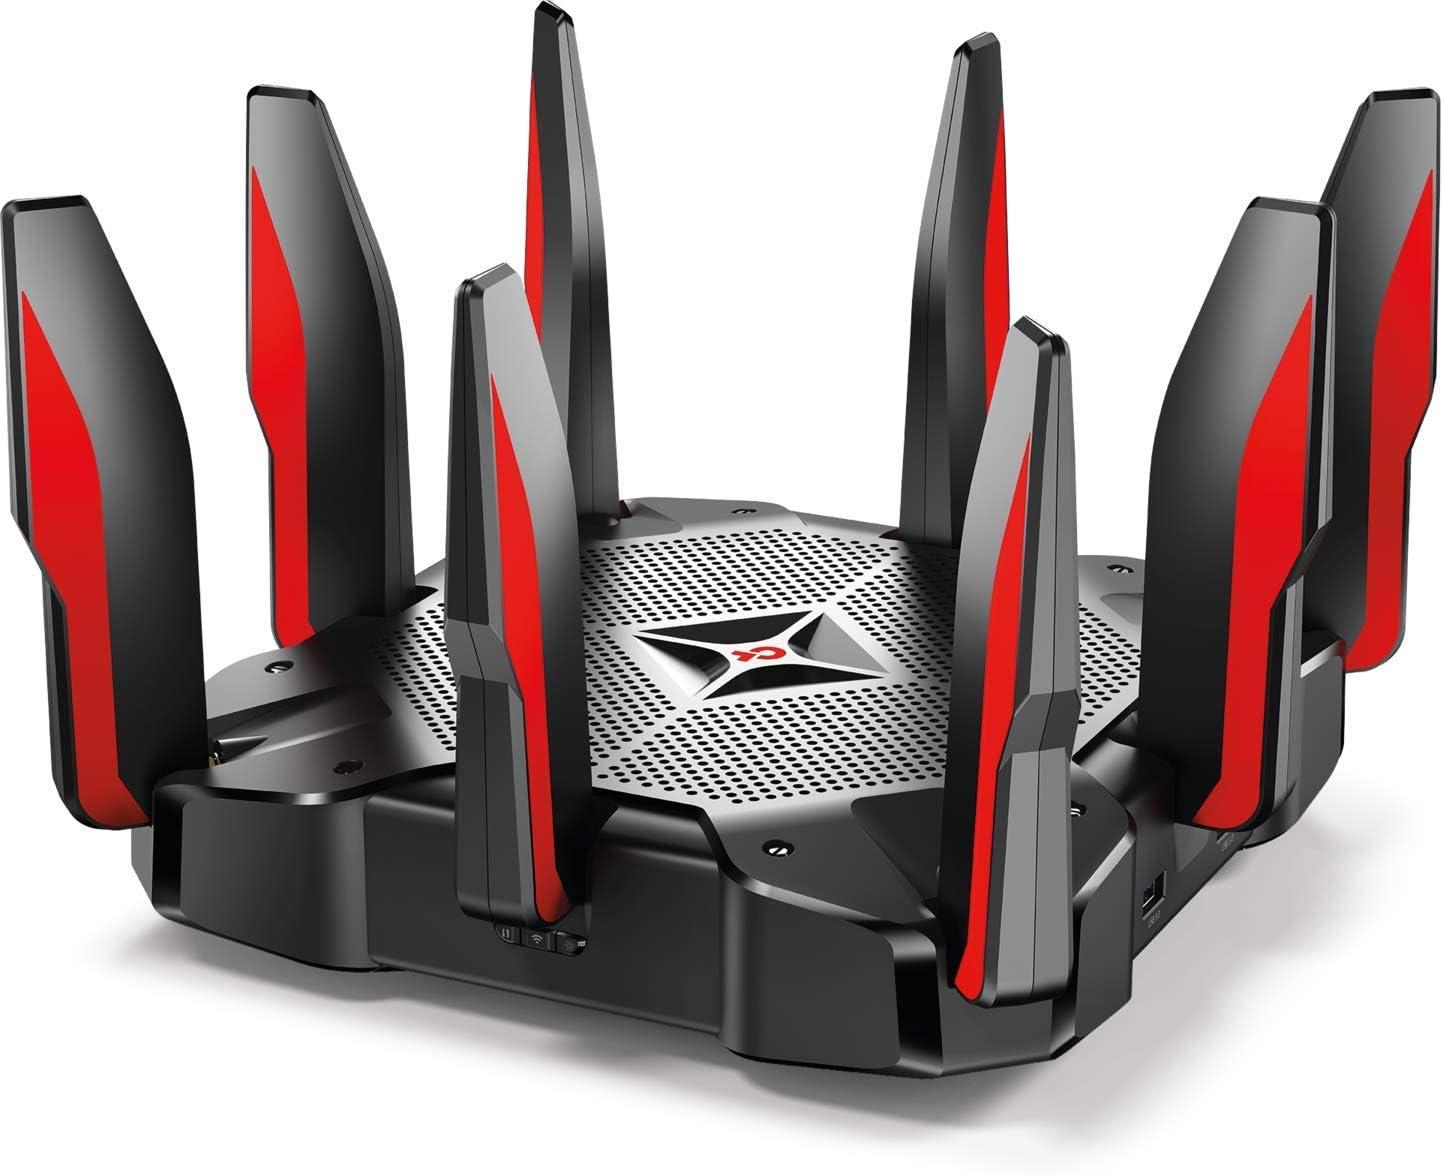 TP-Link Archer C5400X AC5400  16GB Wireless Tri-Band Gigabit Router $200 Coupon